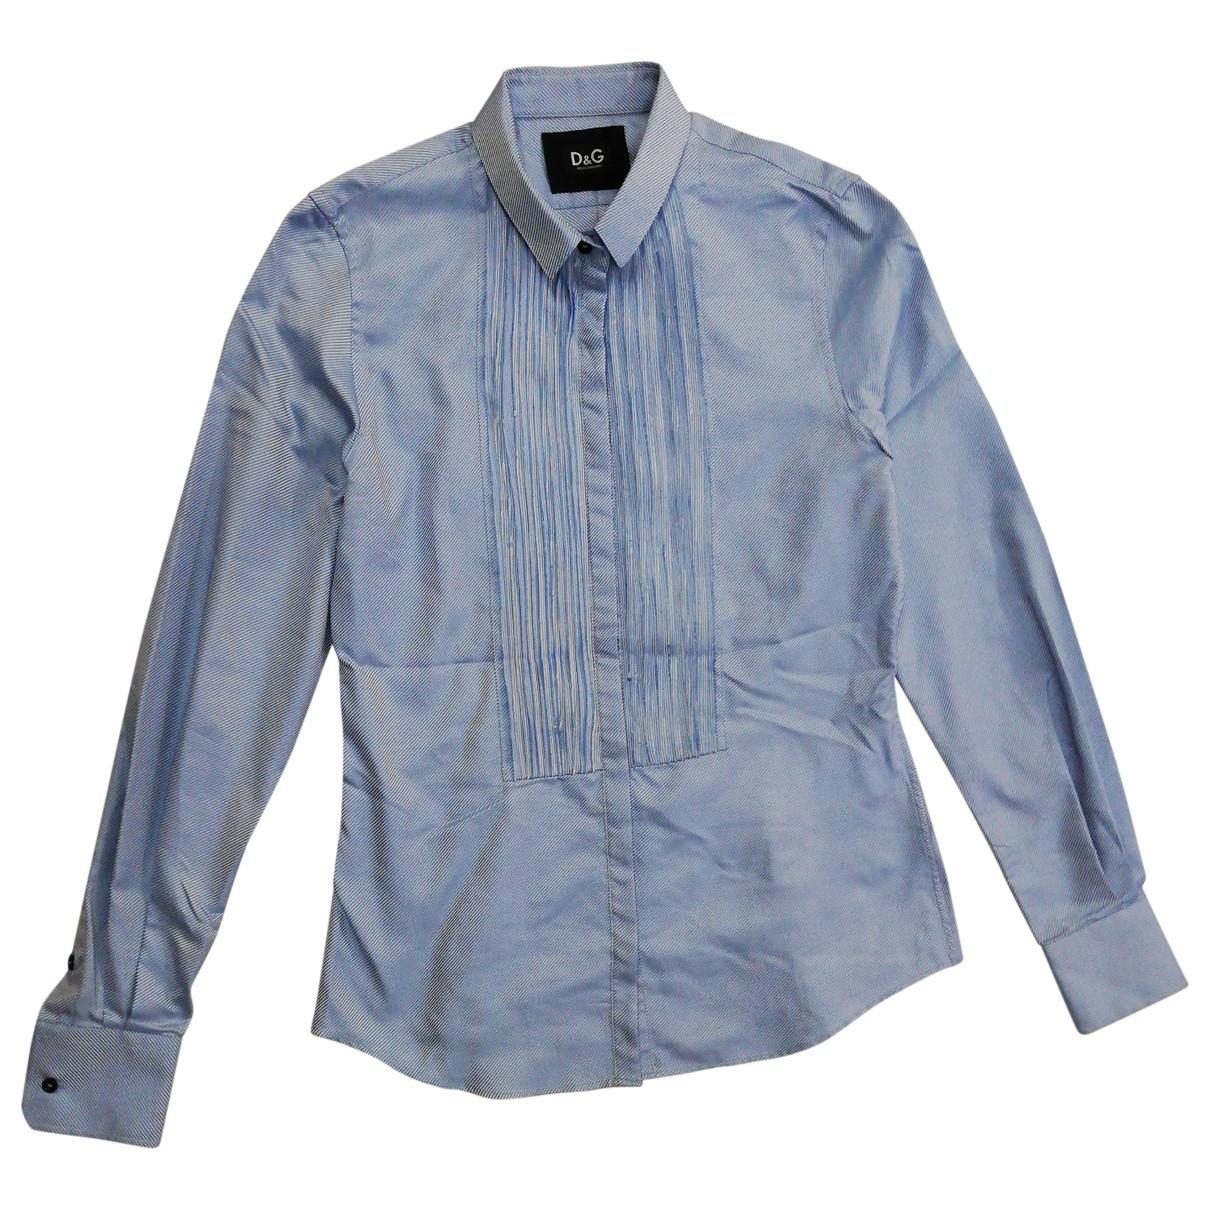 D&g \N Blue Silk  top for Women 42 IT